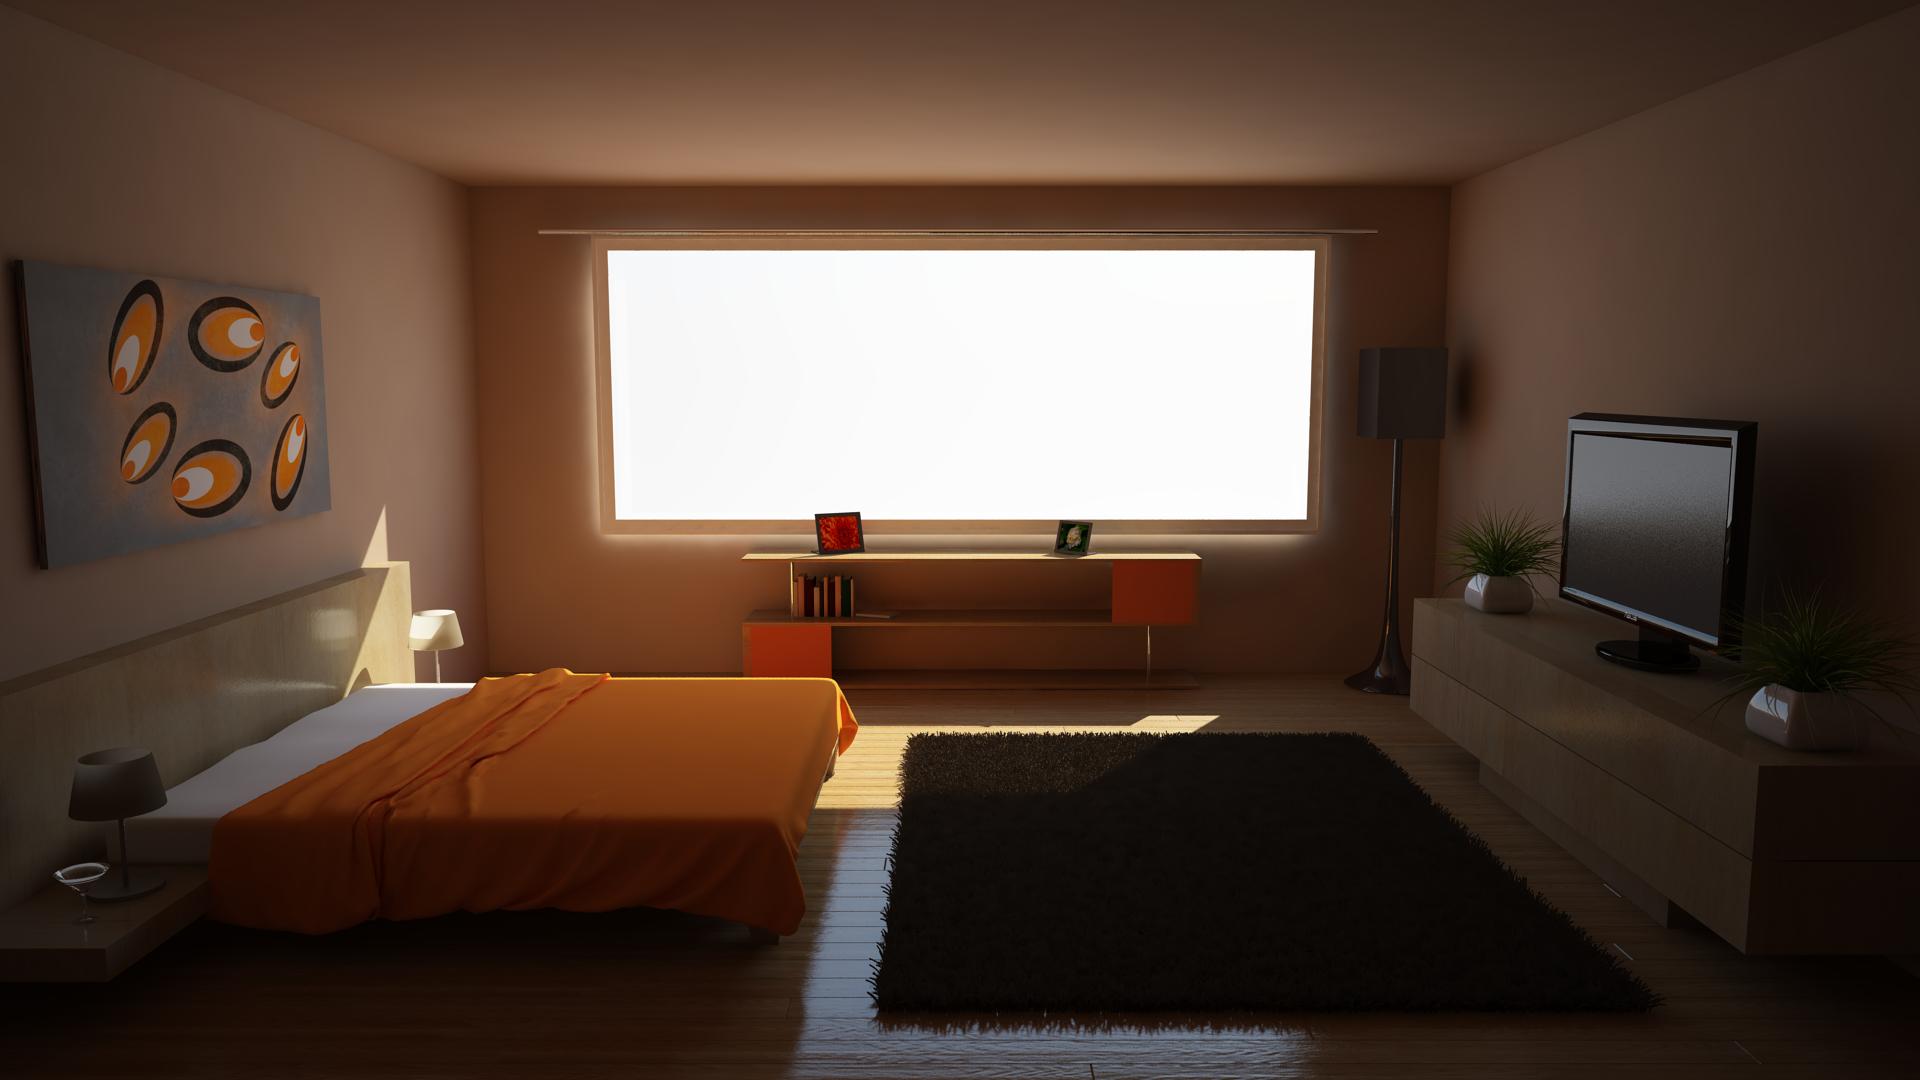 Orange Bedroom(READ DESCRIPTION) by MasonButts on DeviantArt